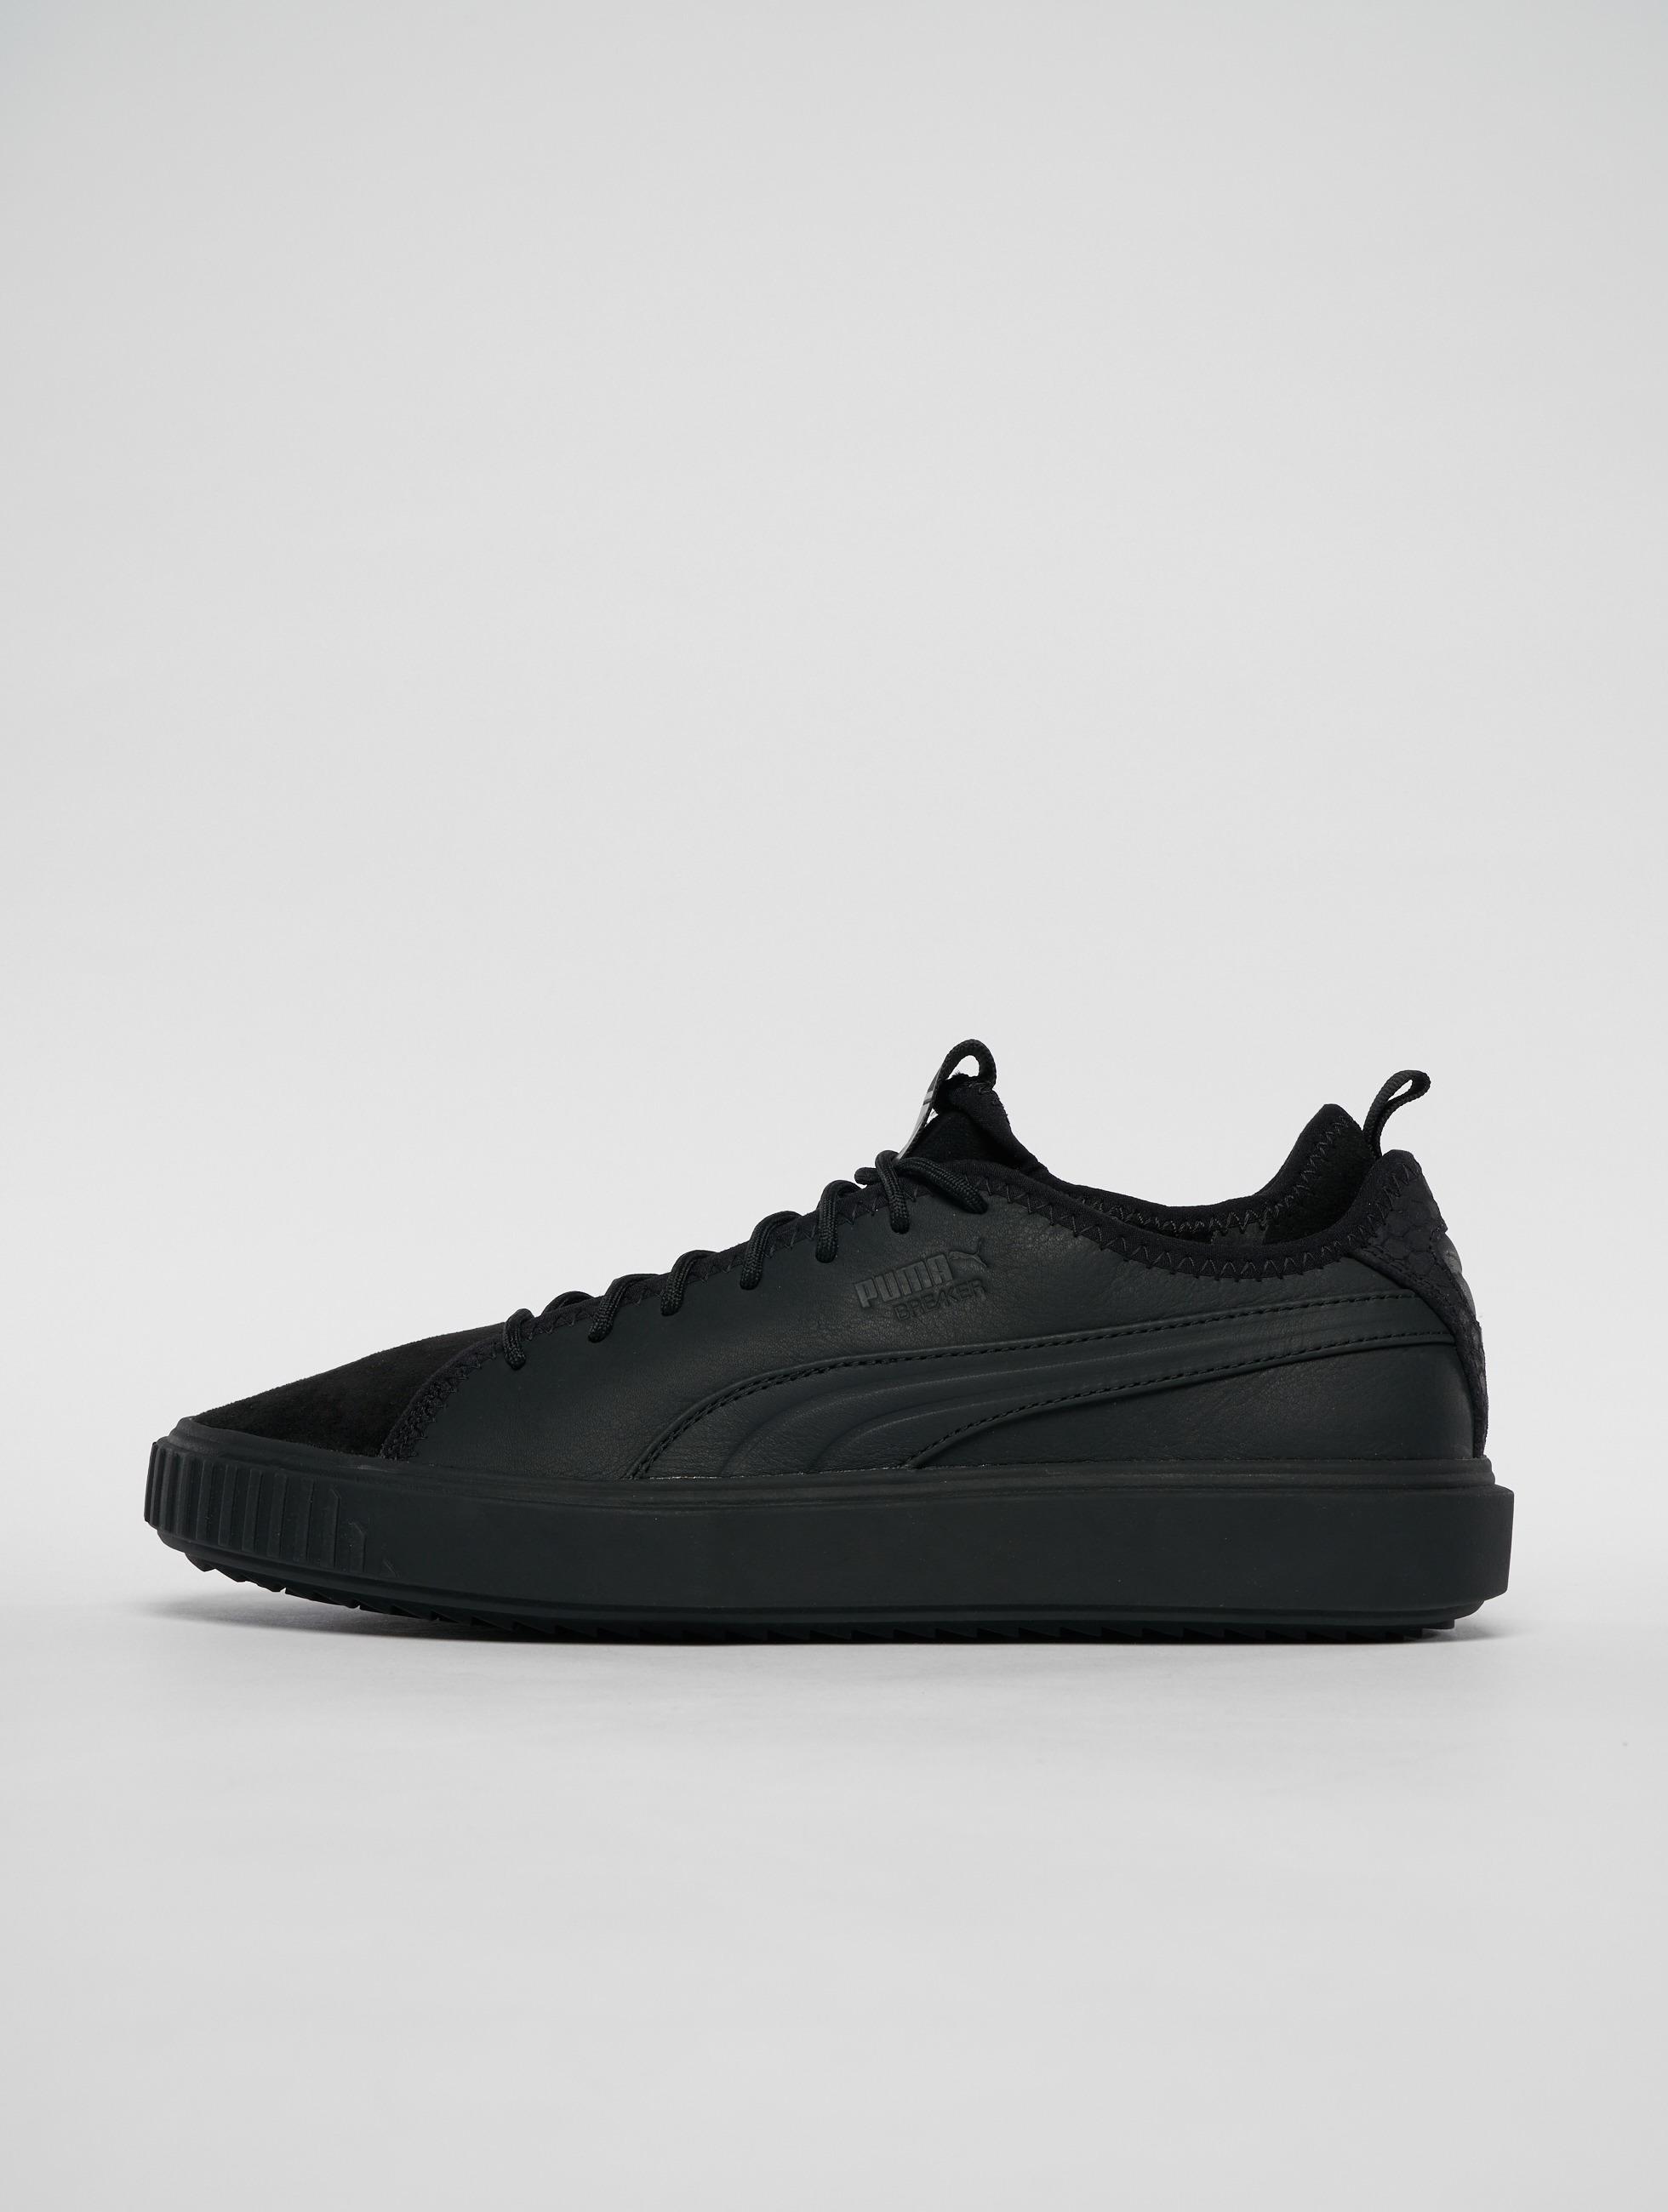 Mesh Breaker Pa Blackpuma Black Puma Sneakers rBsQthCxd